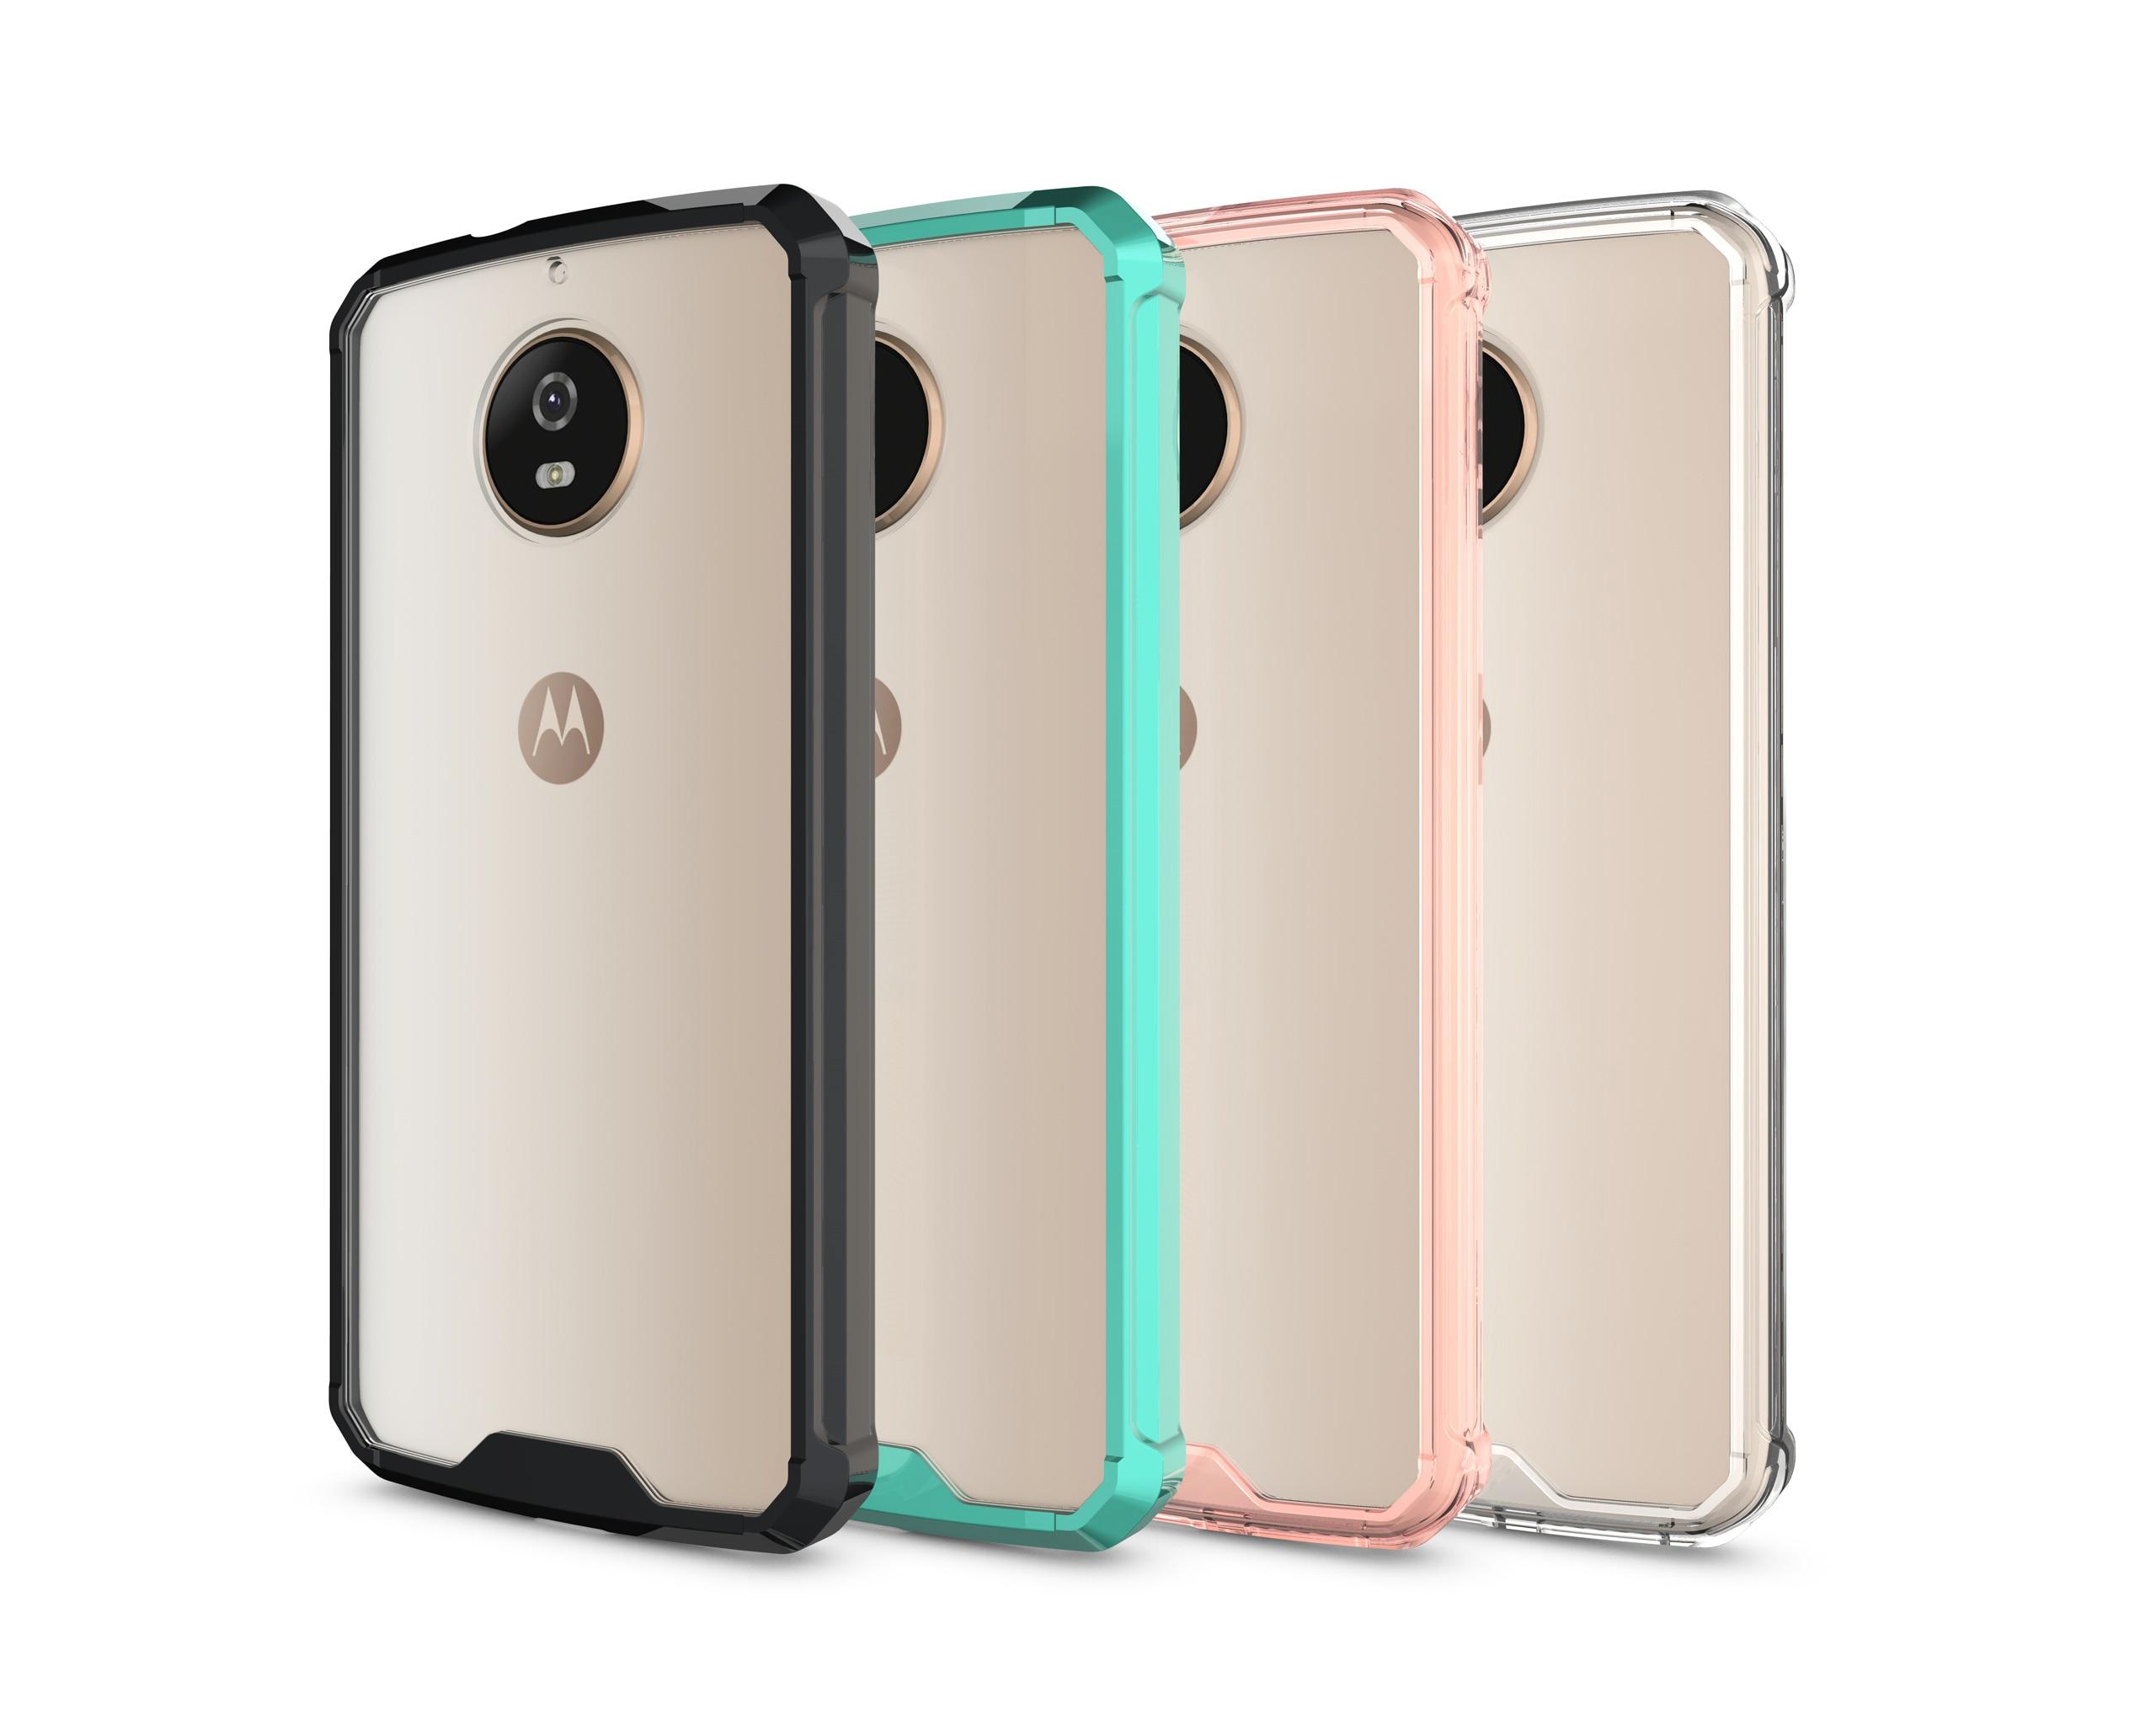 2017 Luxury for Motorola Moto G5S MotoG5S TPU Case for Motorola Moto G 5 S Transparent Armor Phone bag Cover Leather case